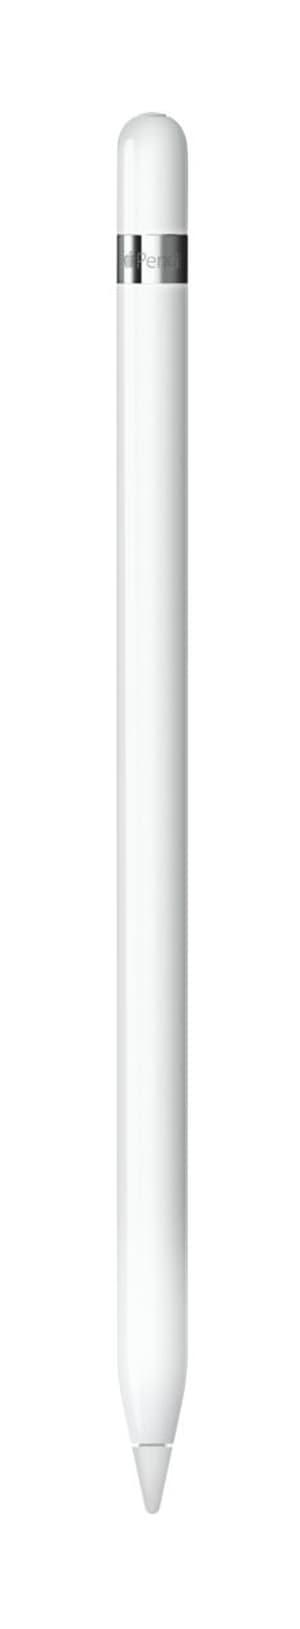 iPad Pencil (1. Generation)